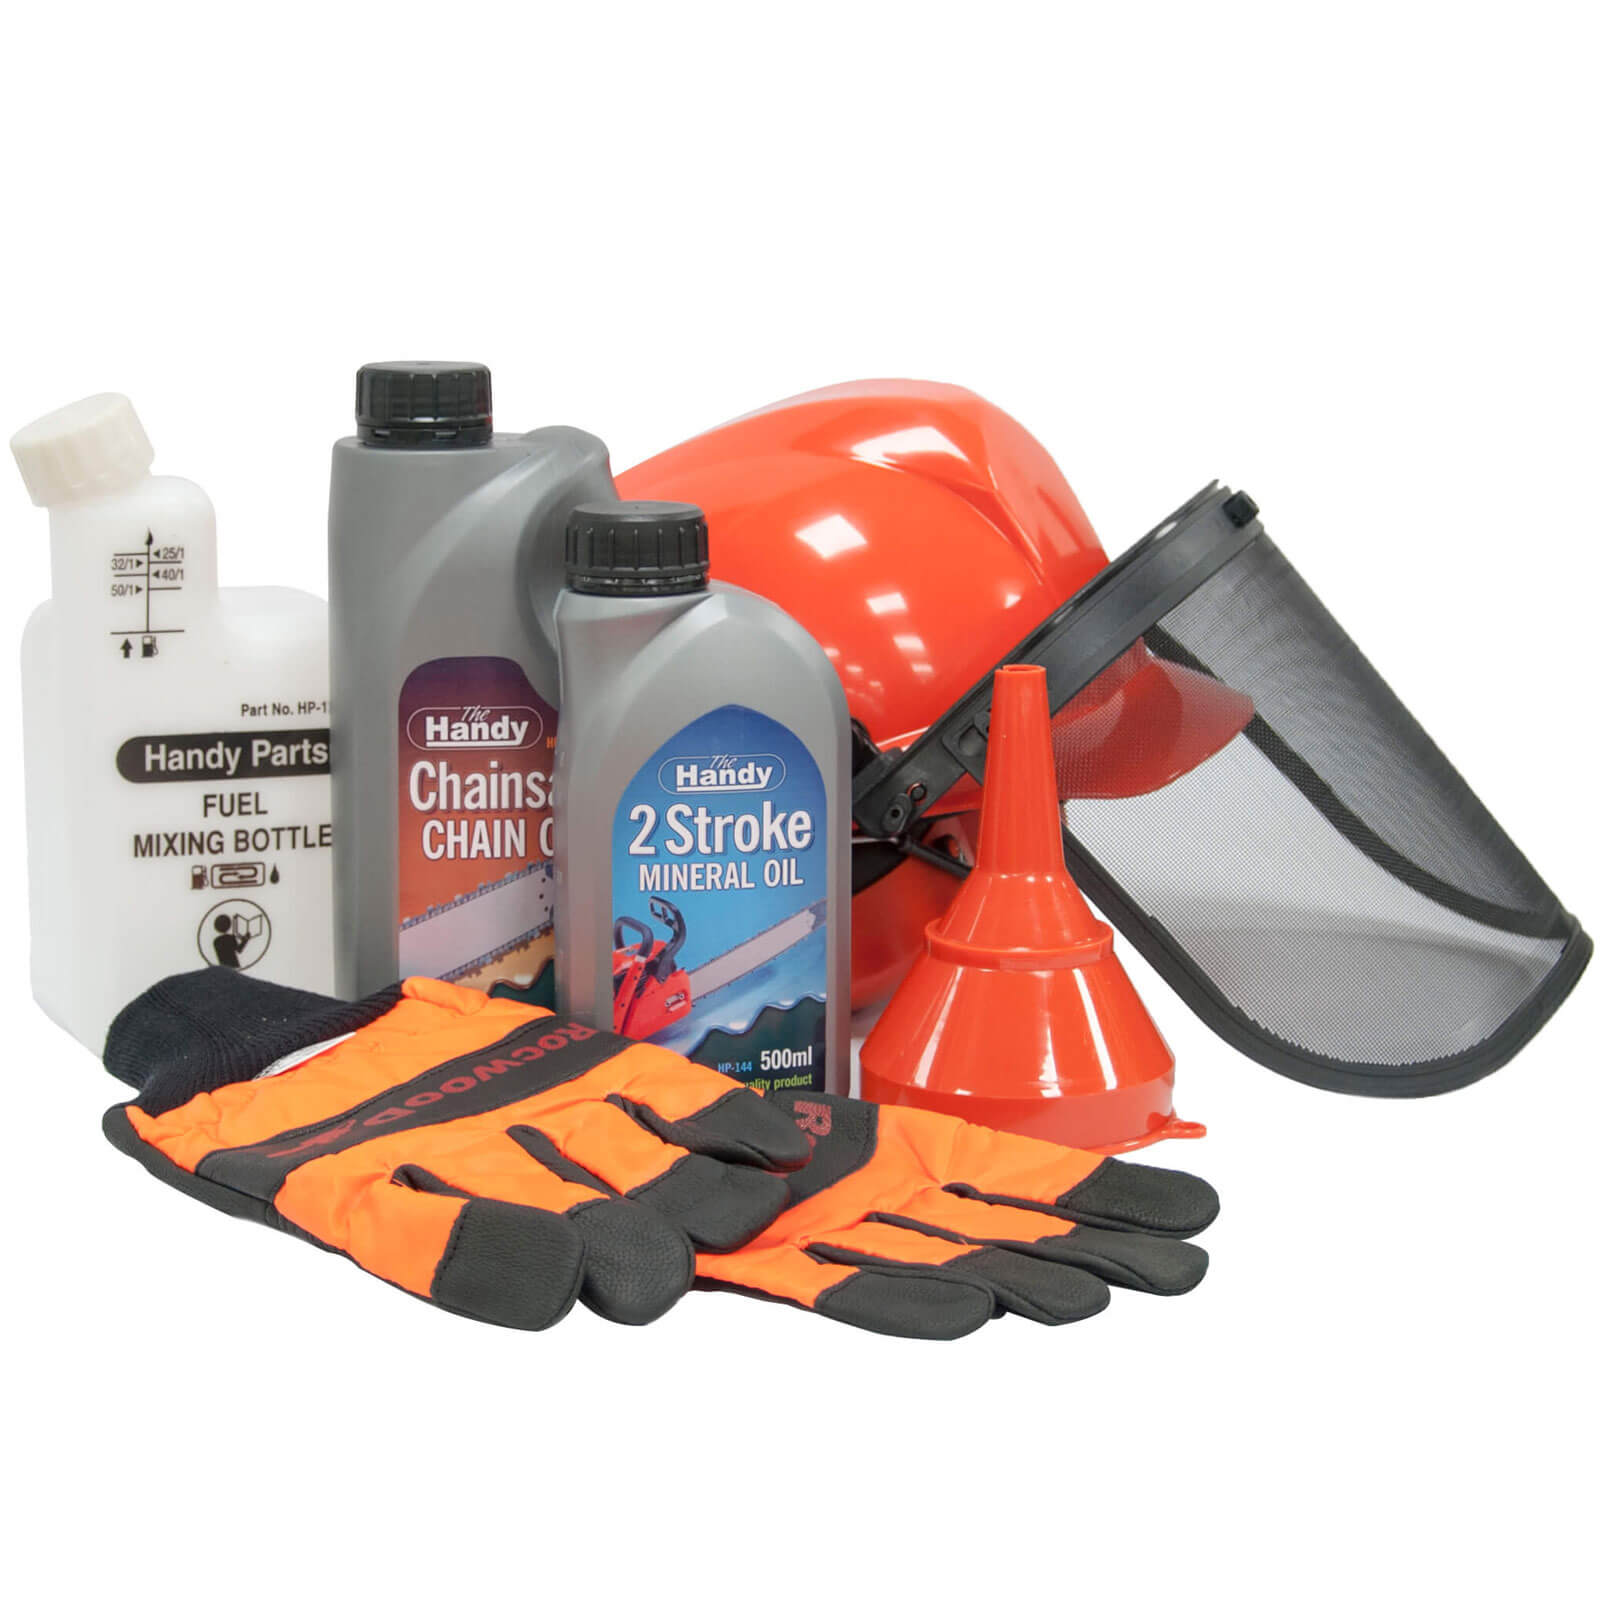 Handy Petrol Chainsaw Starter Kit